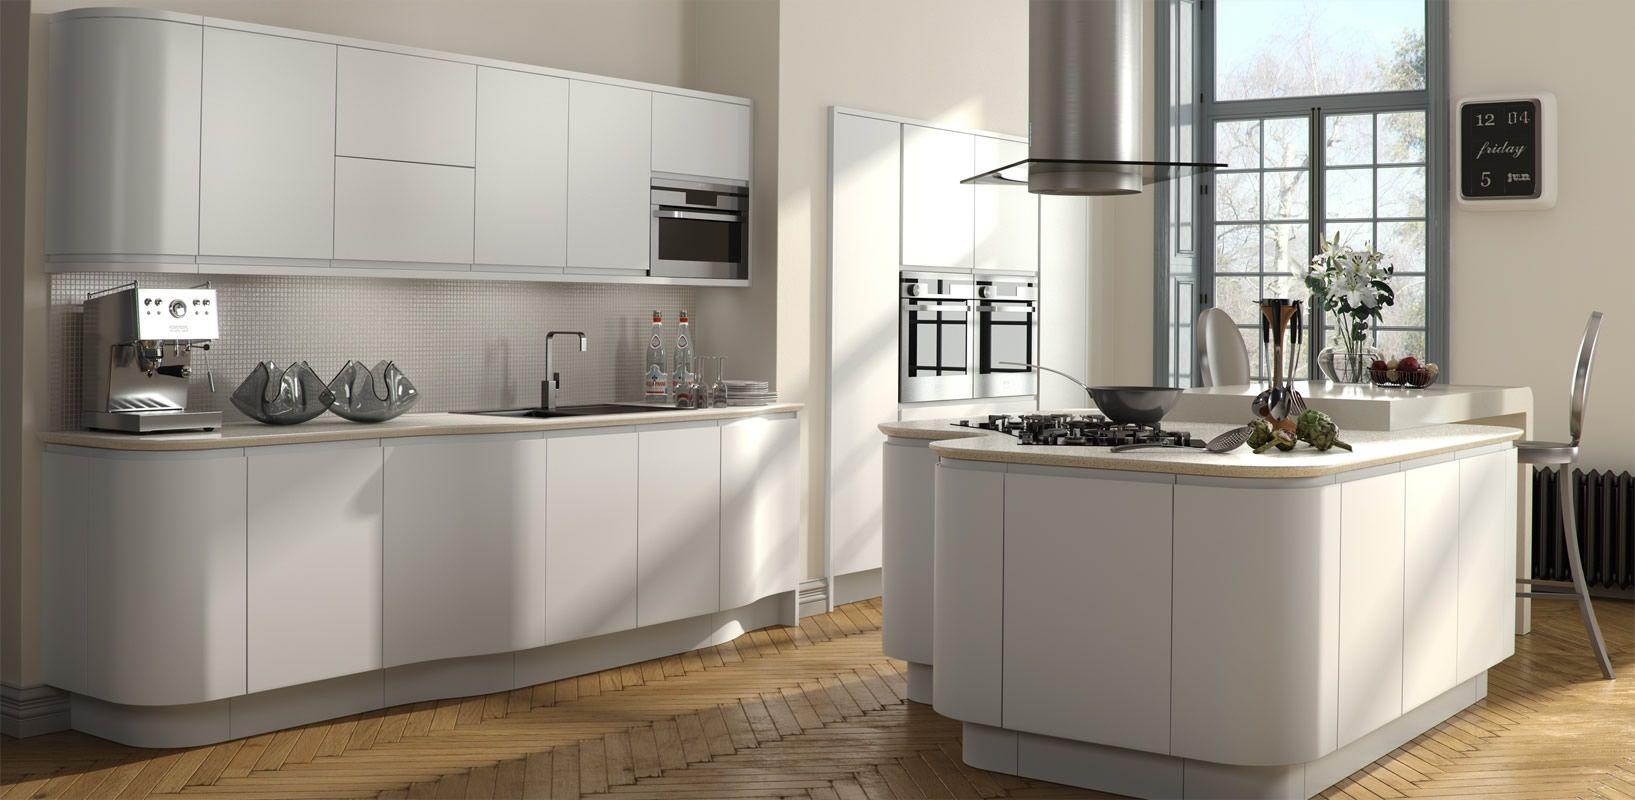 Best Fully Integrated Cabinet Detail Slab Doors Matte White 400 x 300